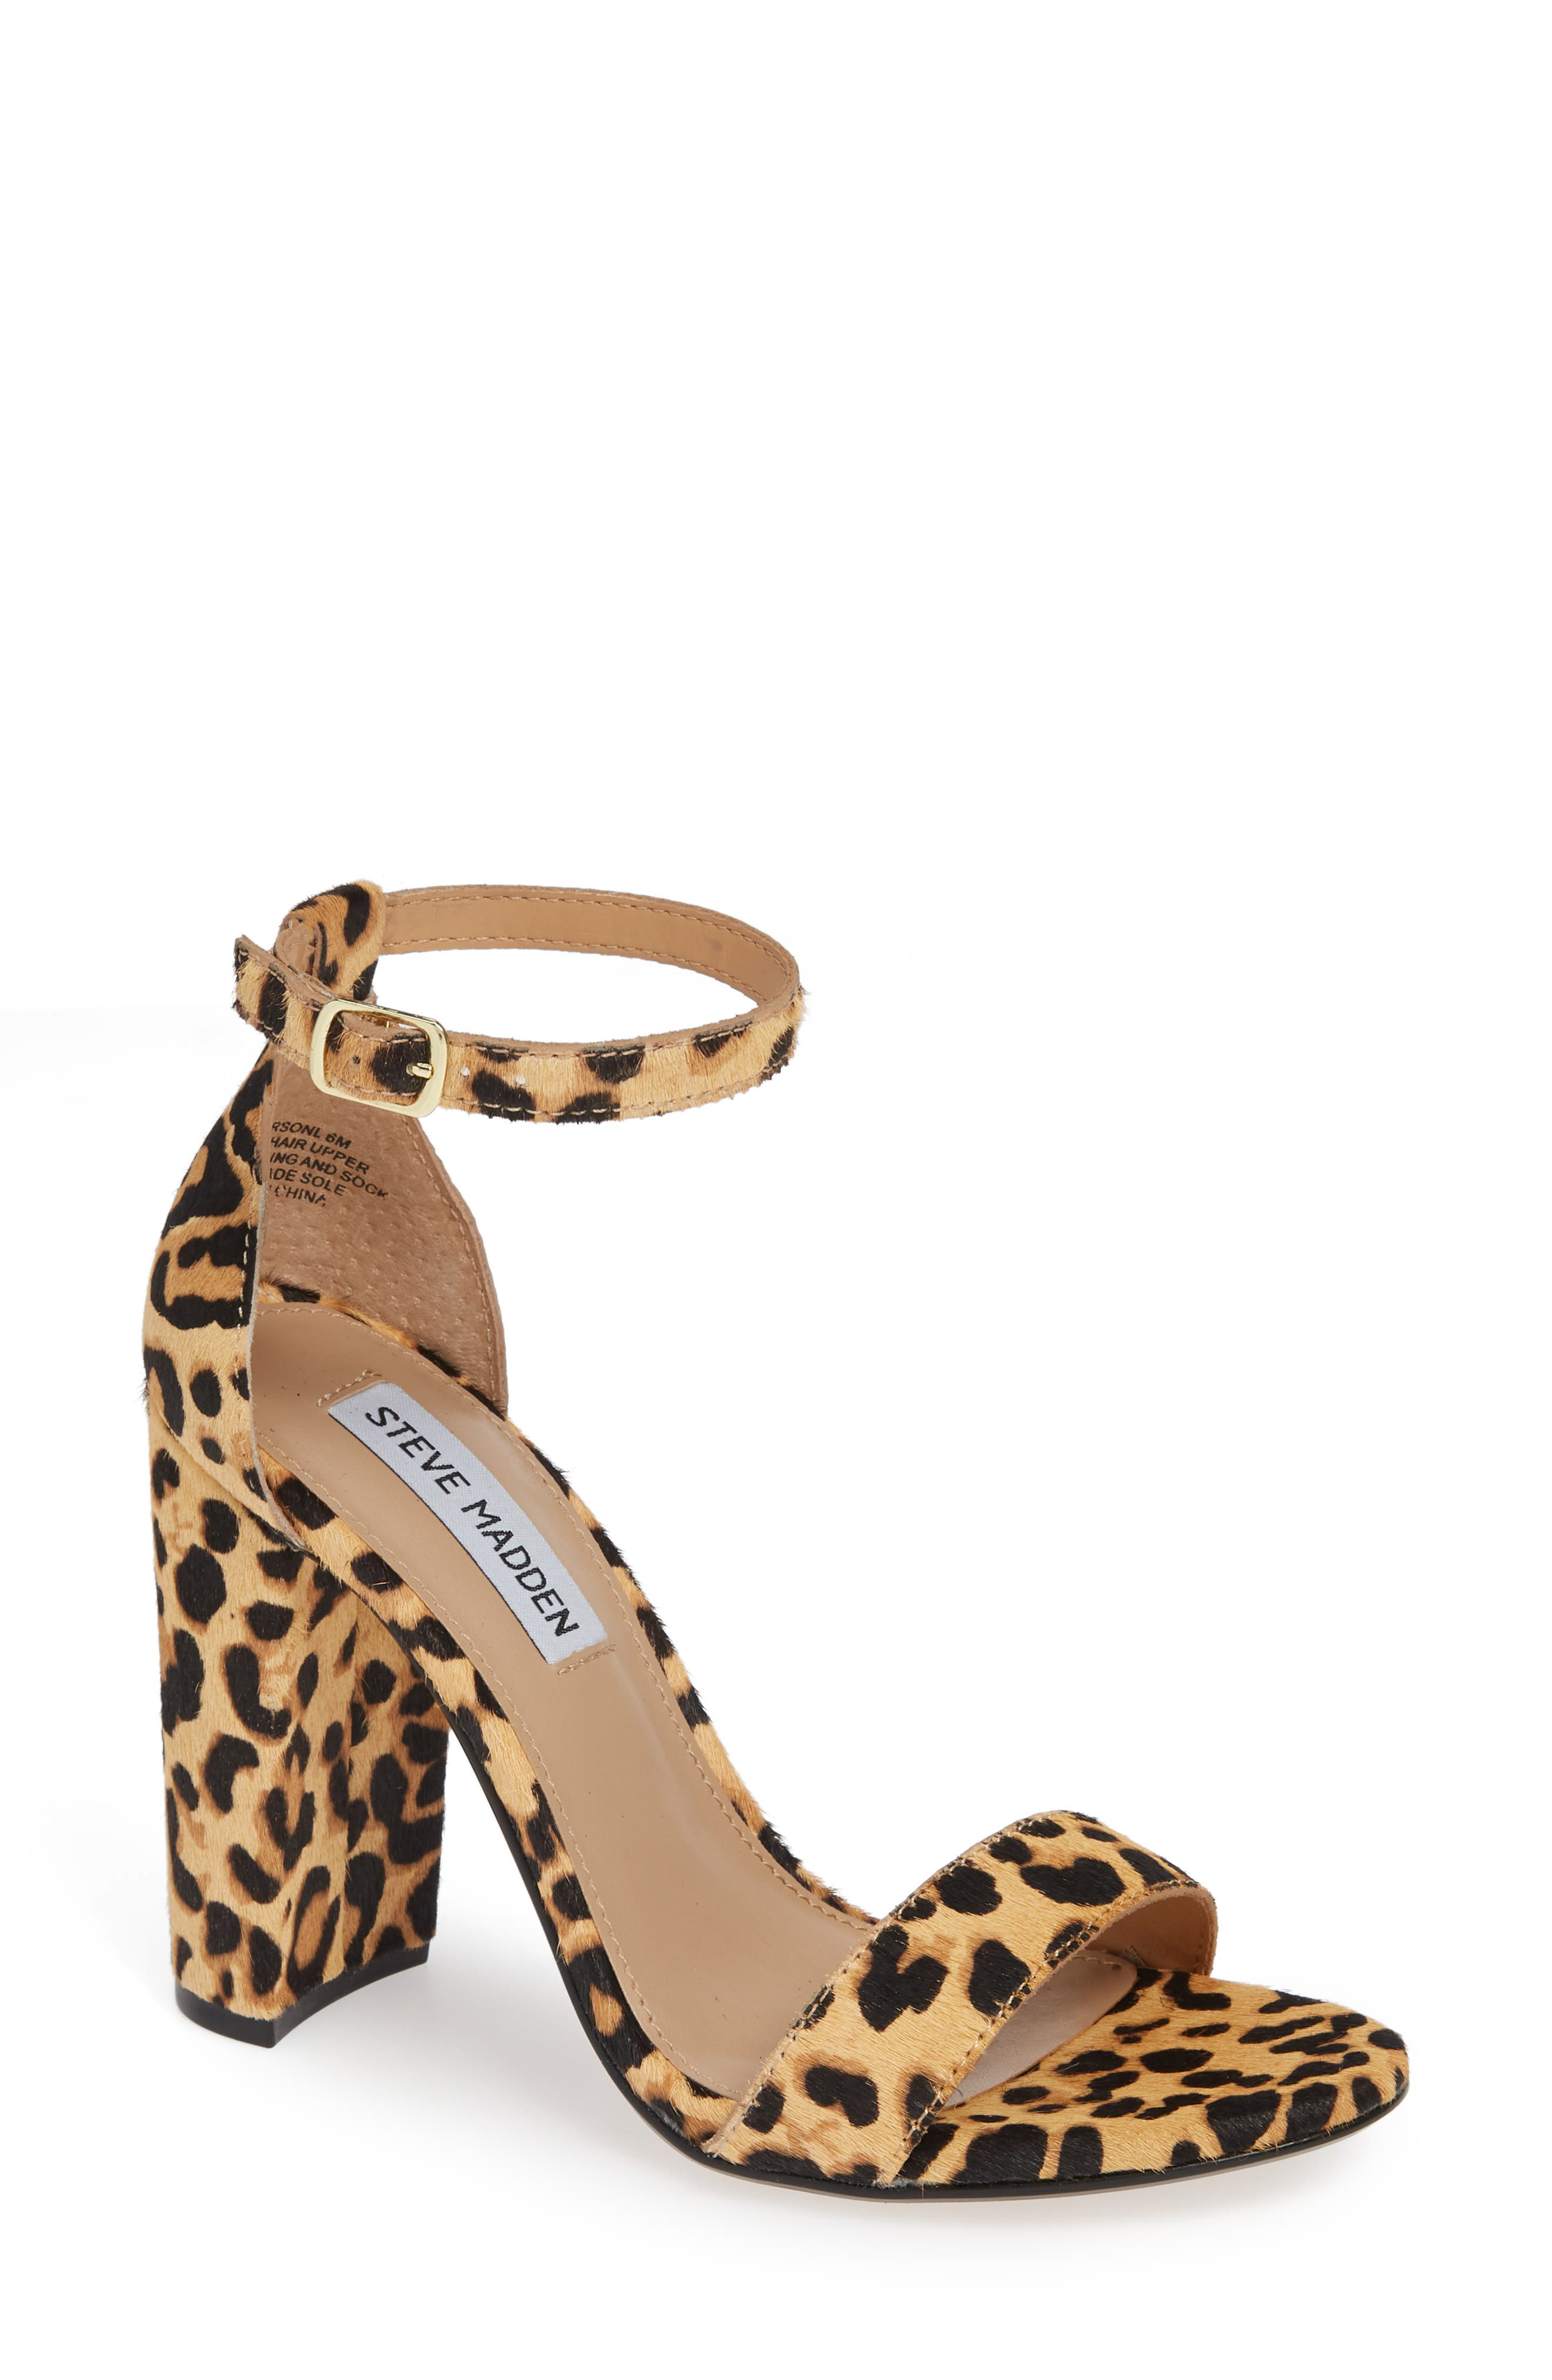 'Carrson' Sandal,                         Main,                         color, LEOPARD MULTI